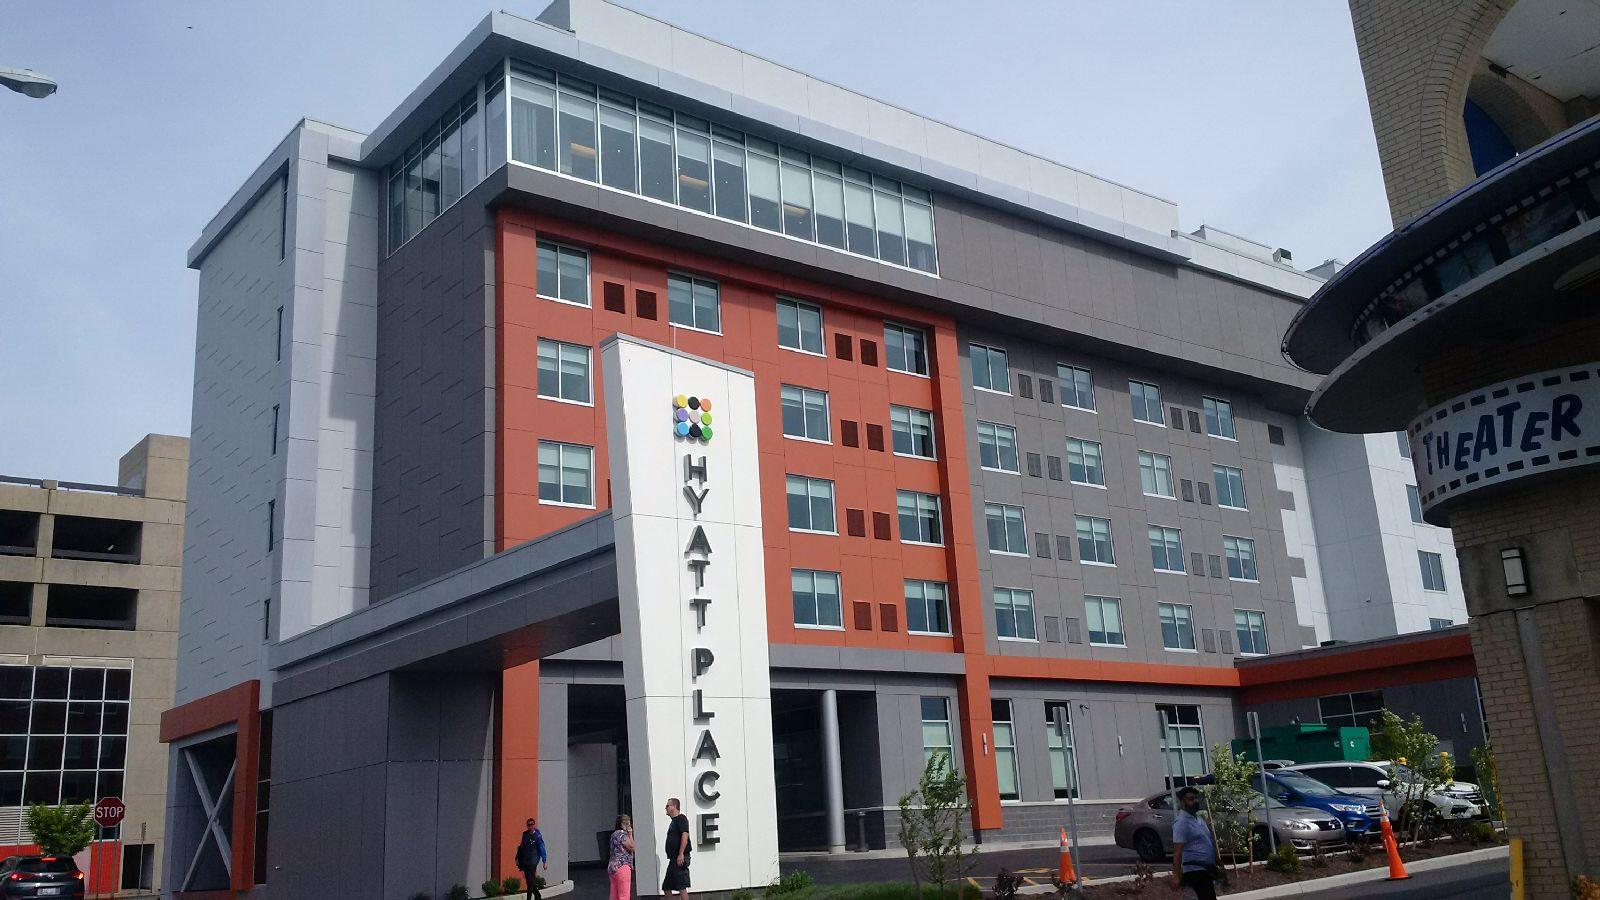 hyatt place hotel in niagara falls new york